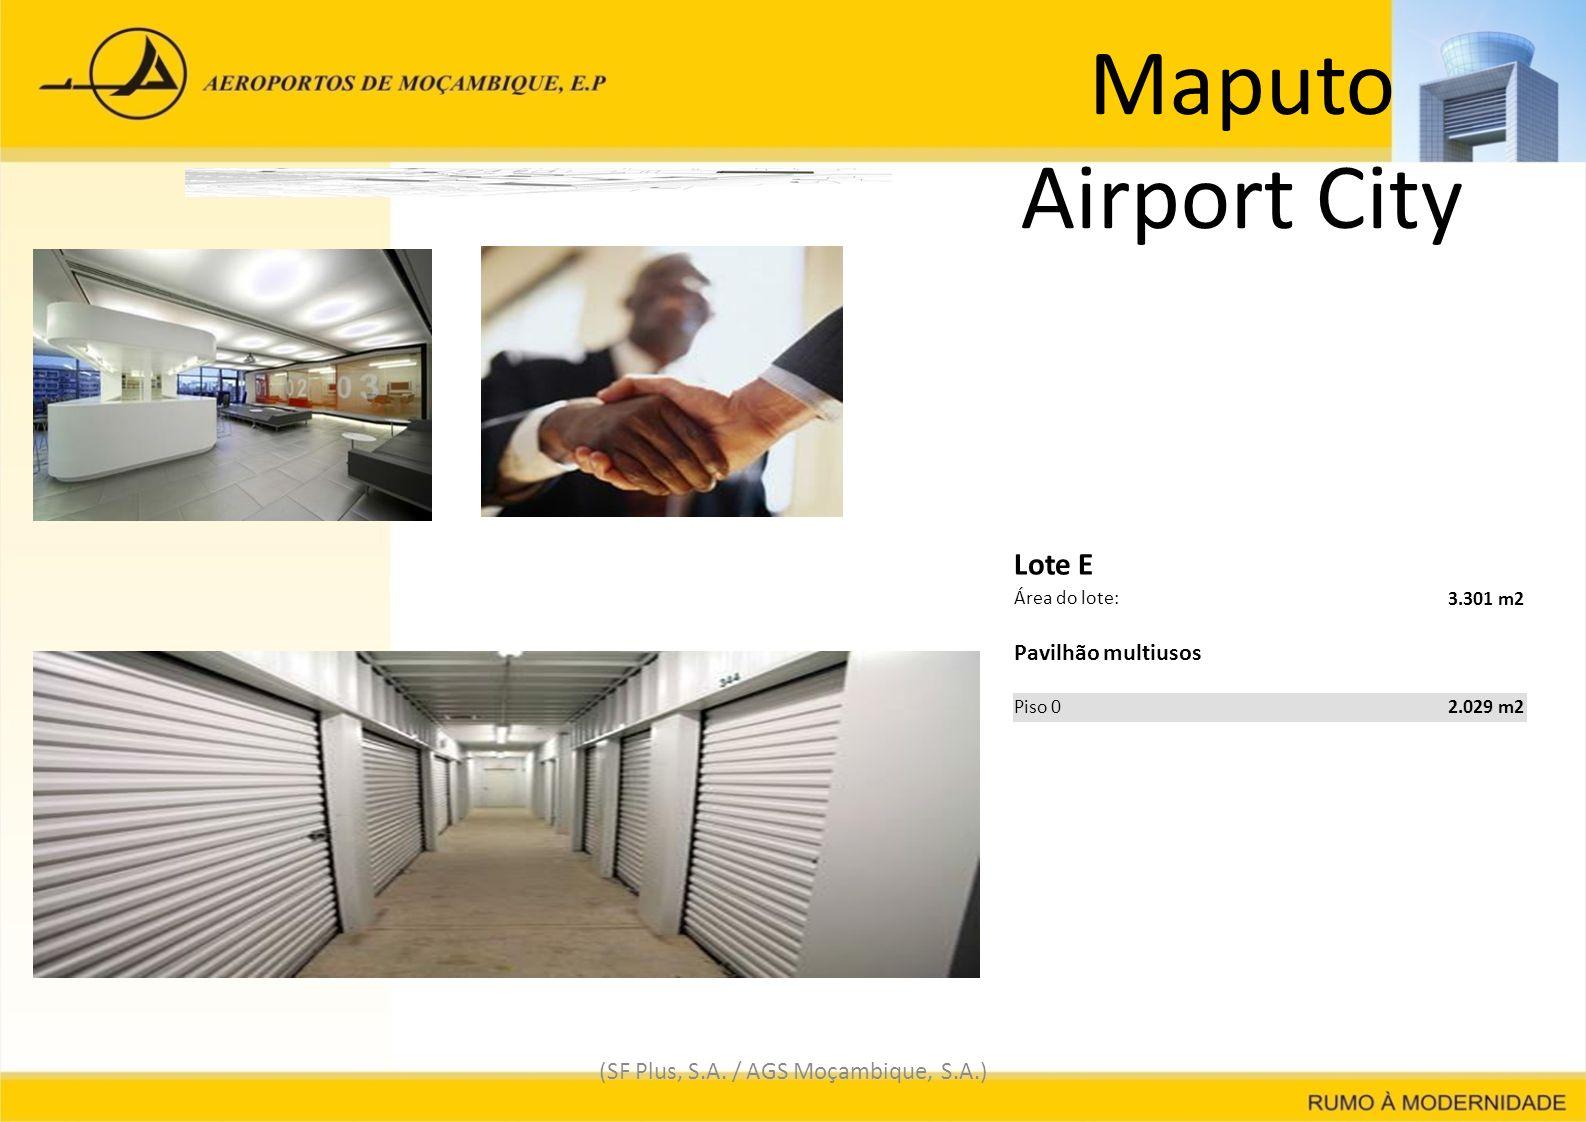 Maputo Airport City (SF Plus, S.A. / AGS Moçambique, S.A.) Lote E Área do lote: 3.301 m23.301 m2 Pavilhão multiusos Piso 02.029 m22.029 m2